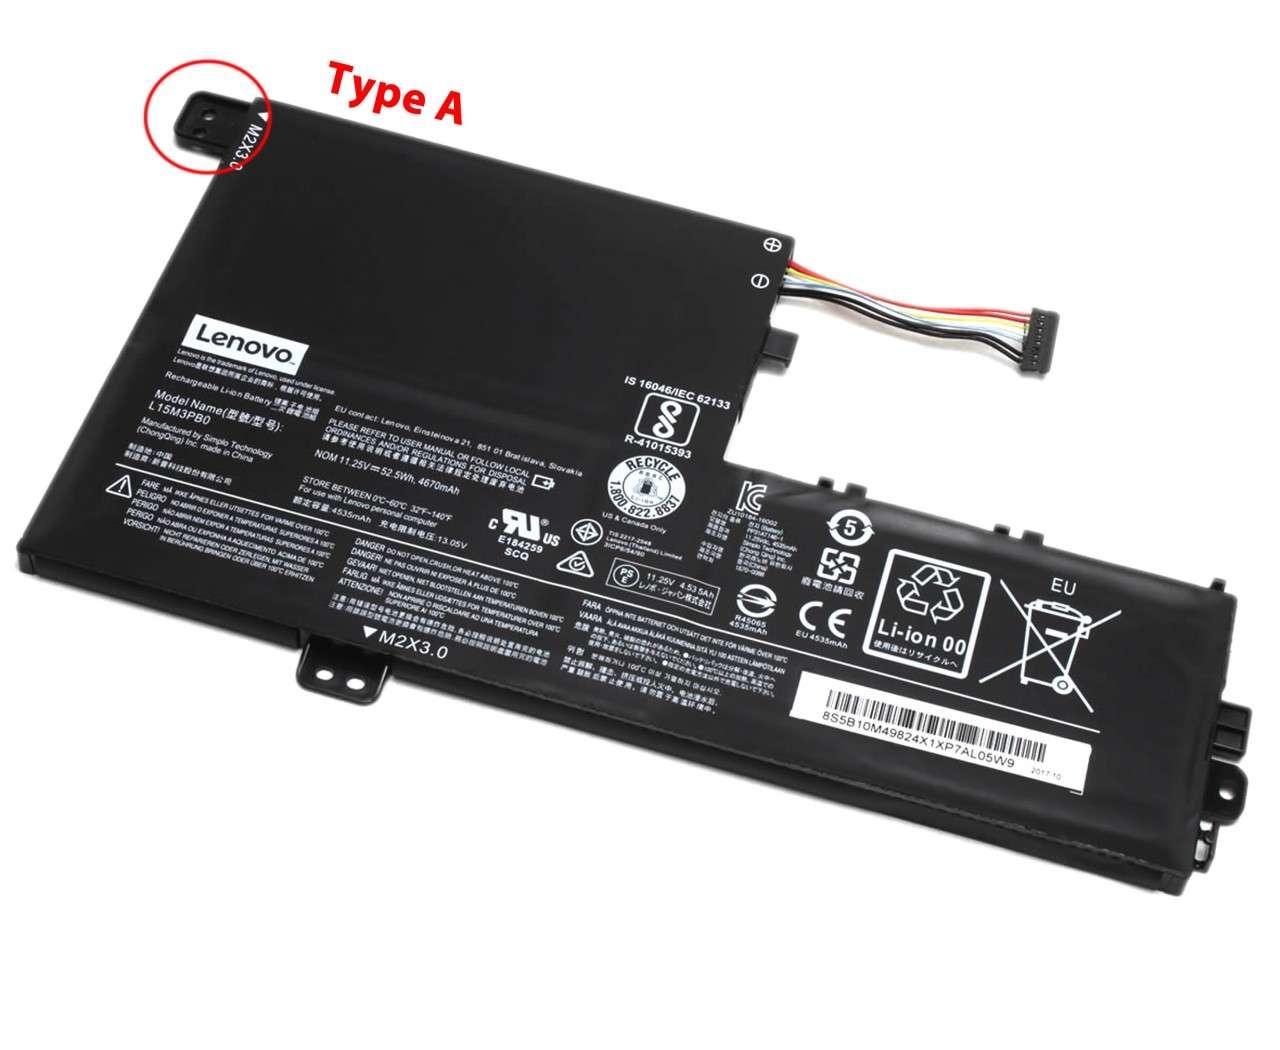 Baterie Lenovo IdeaPad 320S 15IKB Originala 52.5Wh Type A imagine powerlaptop.ro 2021